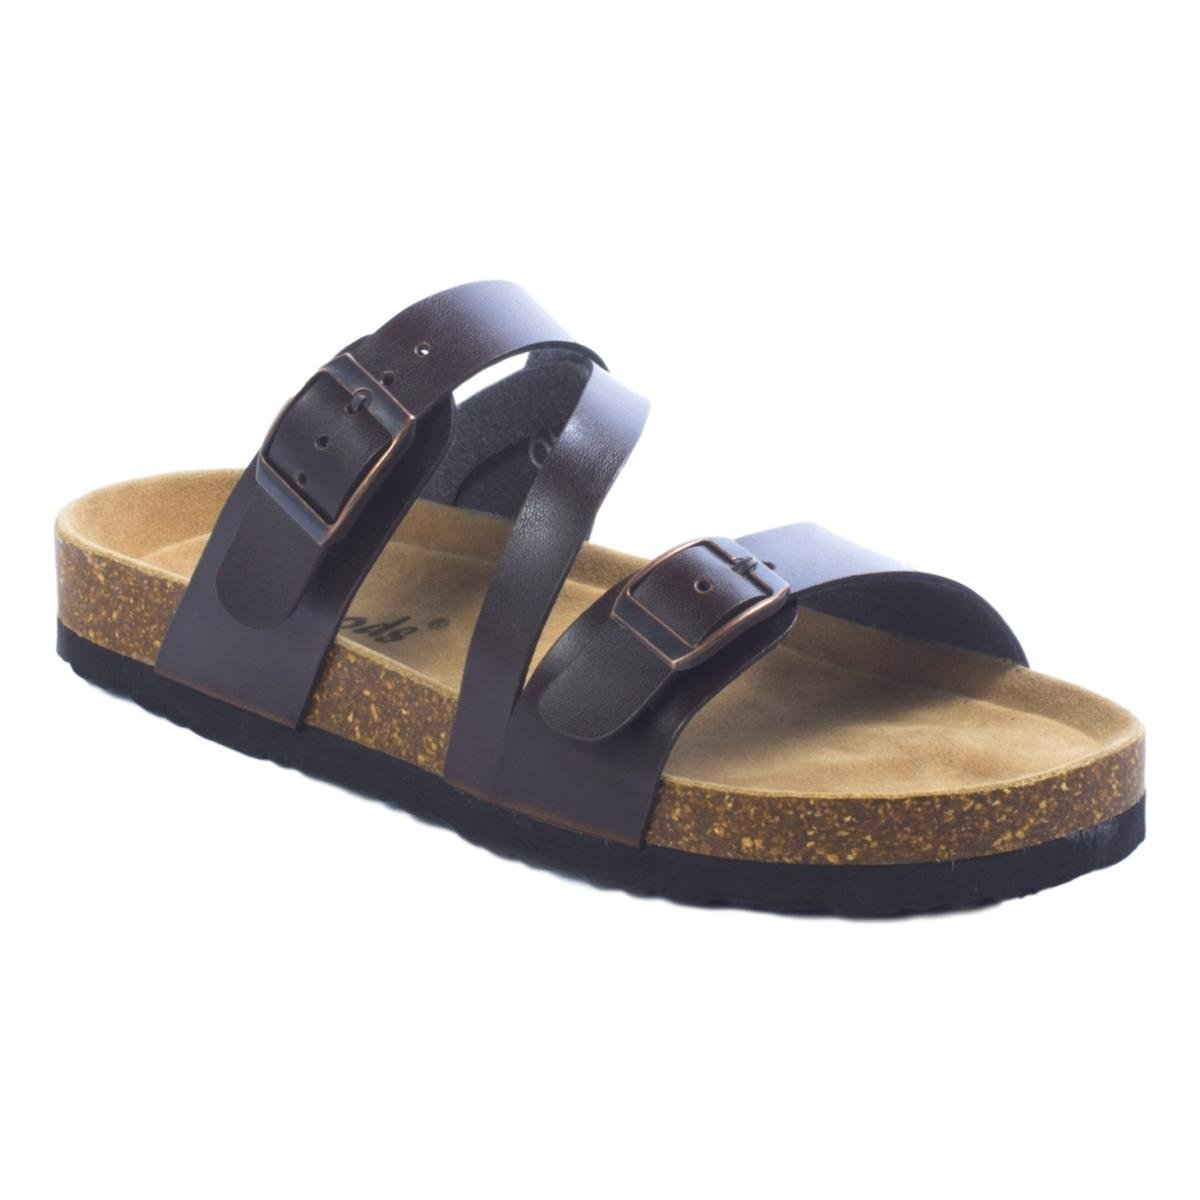 OUTWOODS Women's Bork-56 Vegan Leather Adjustable Strap Buckle Flats Sandals (6 B(M) US, Brown)